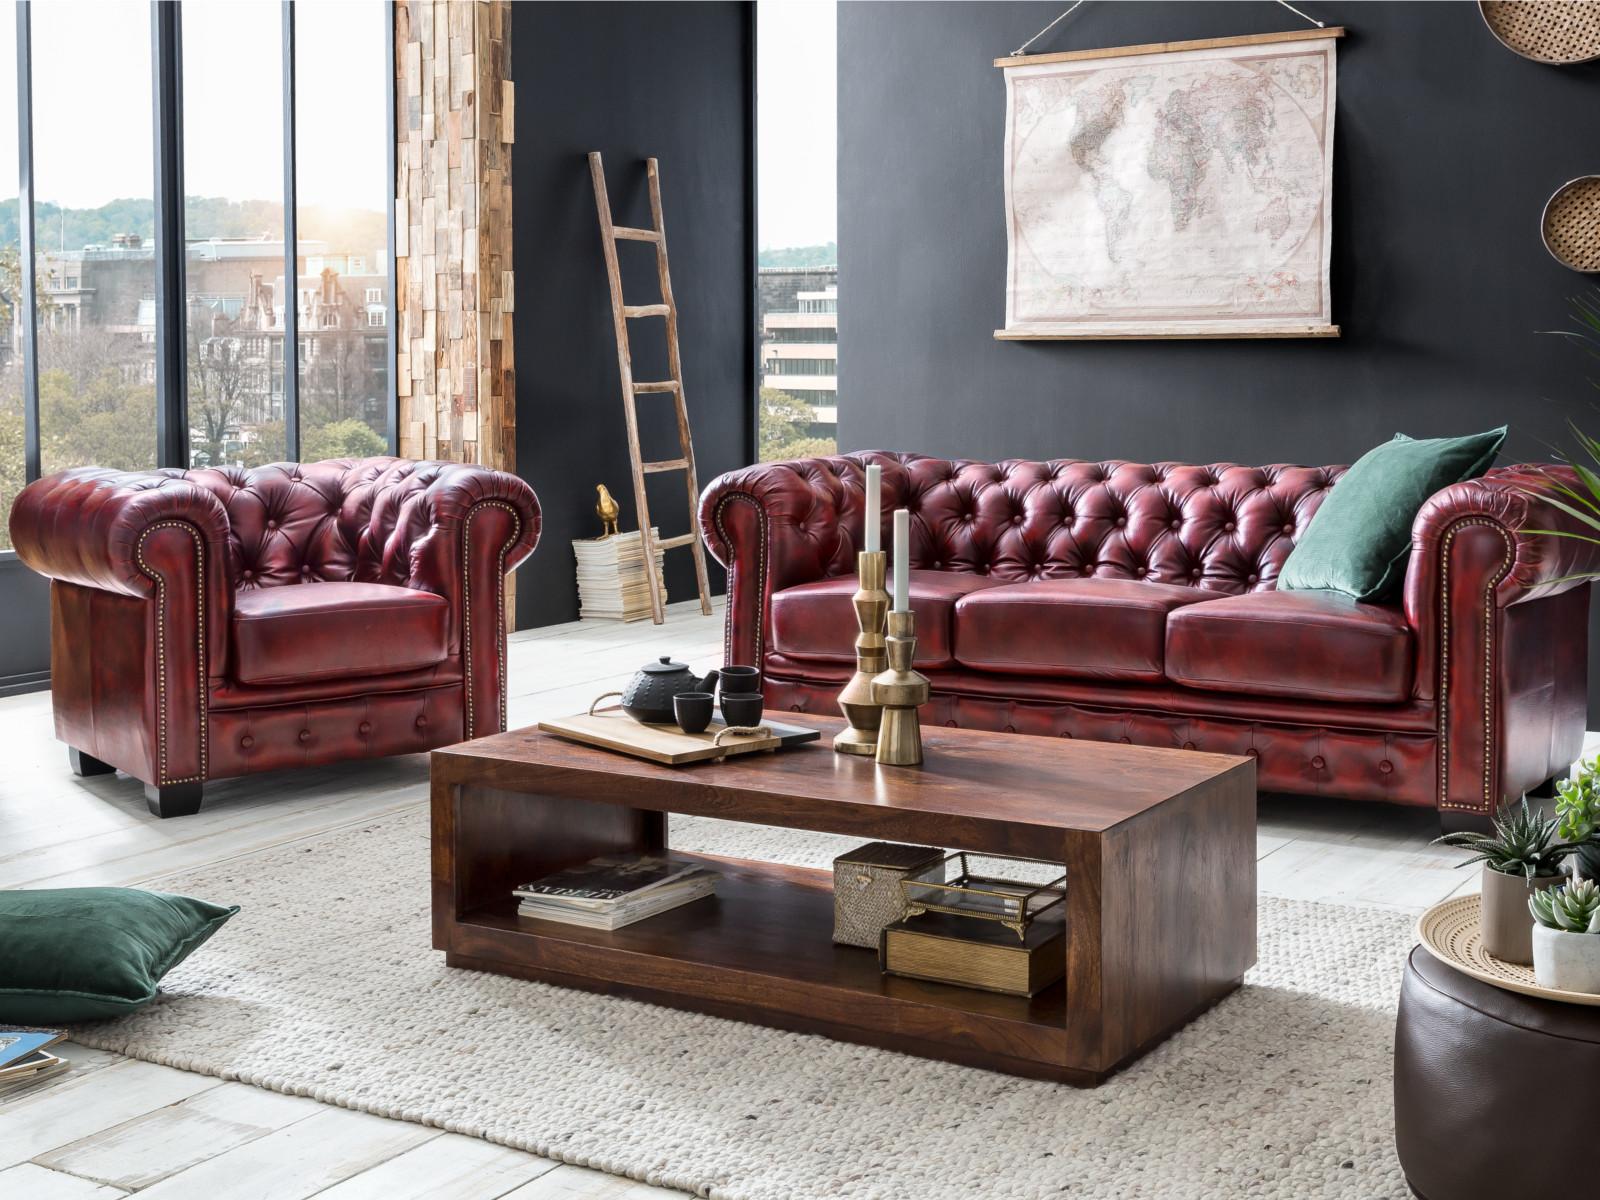 Full Size of Sofa Garnitur Leder Gebraucht Kasper Wohndesign Schwarz Garnituren 3 2 1 Couch Ikea 3 Teilig Hersteller 3 2 Sofas Sessel Mbel Woodkings Shop Koinor Elektrisch Sofa Sofa Garnitur